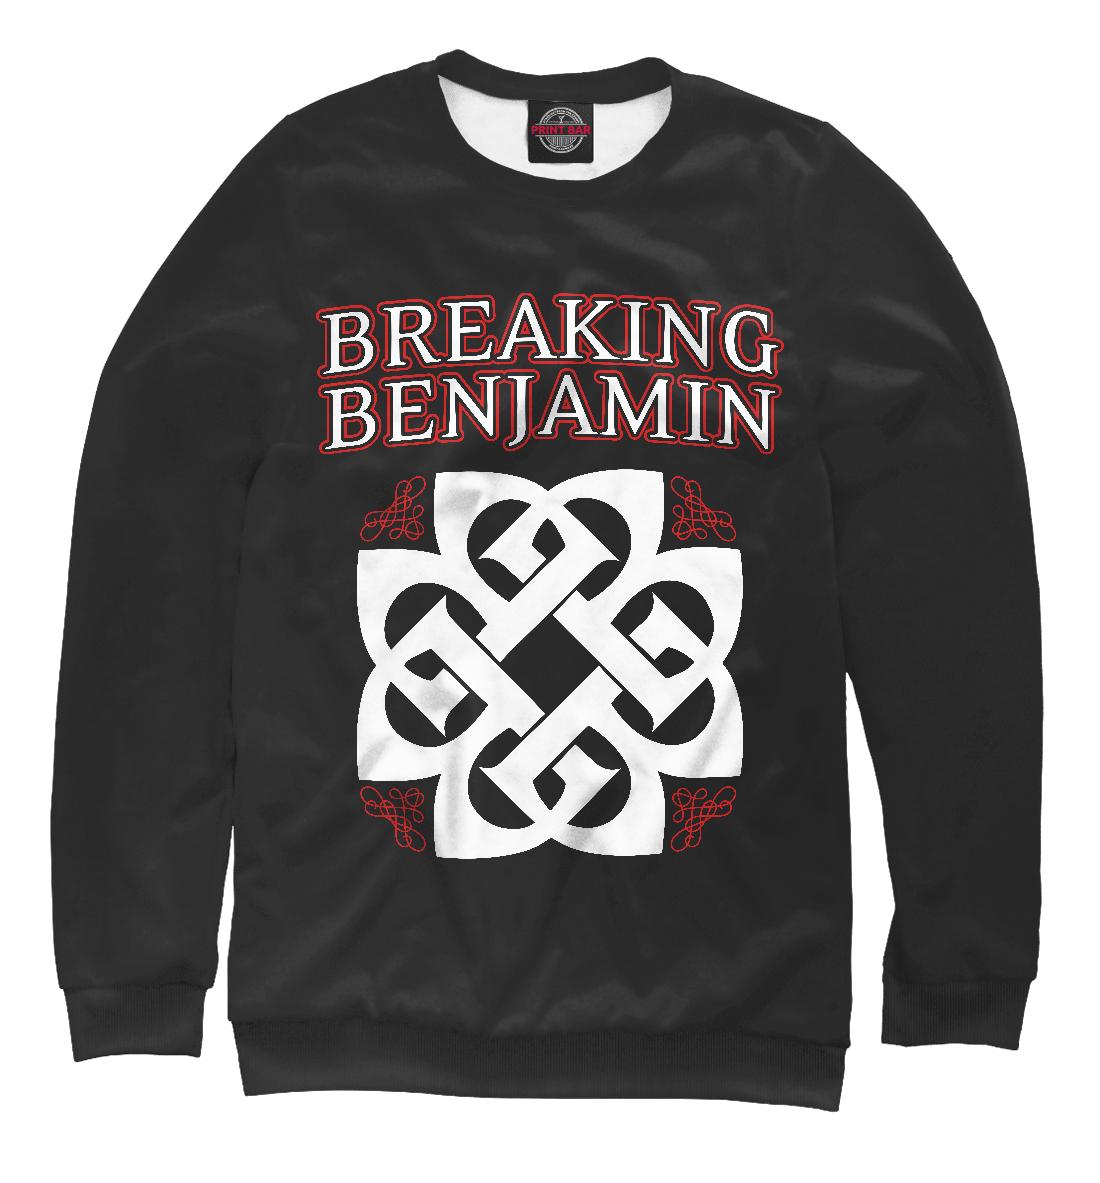 Купить Breaking Benjamin, Printbar, Свитшоты, MZK-832447-swi-1